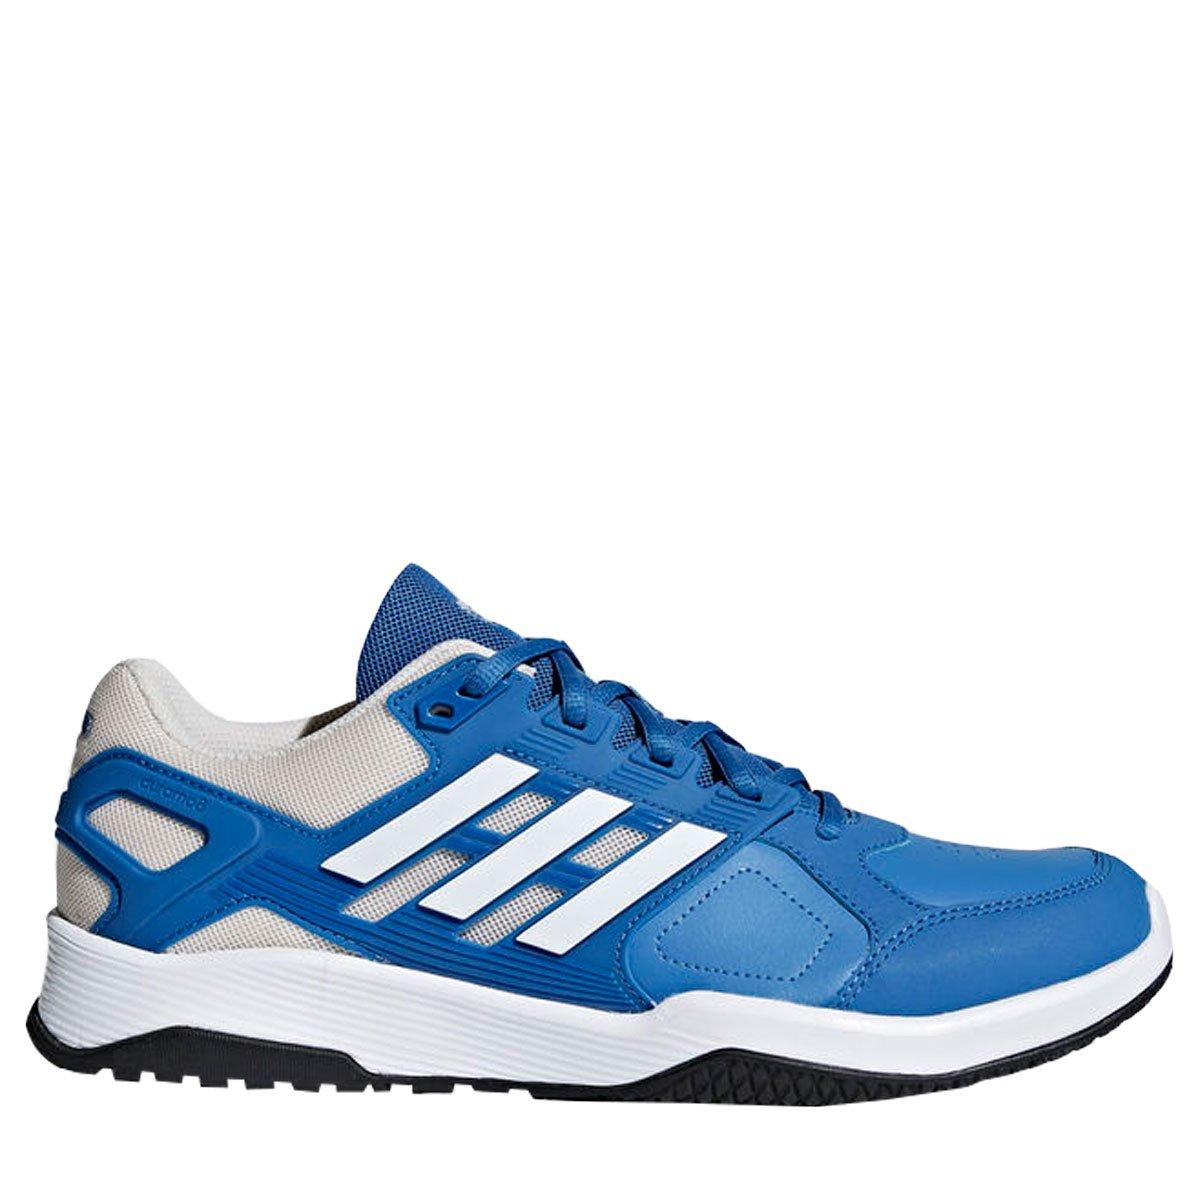 4a8ced00f2530 Bizz Store - Tênis Masculino Adidas Duramo 8 Trainer